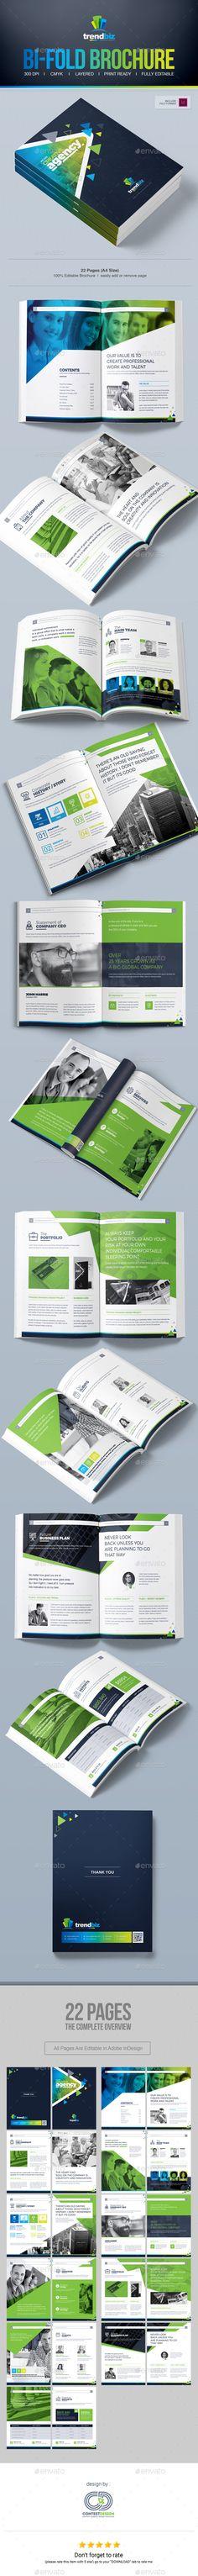 Brochure Design | Bi-Fold Brochure | Brochure Template InDesign INDD